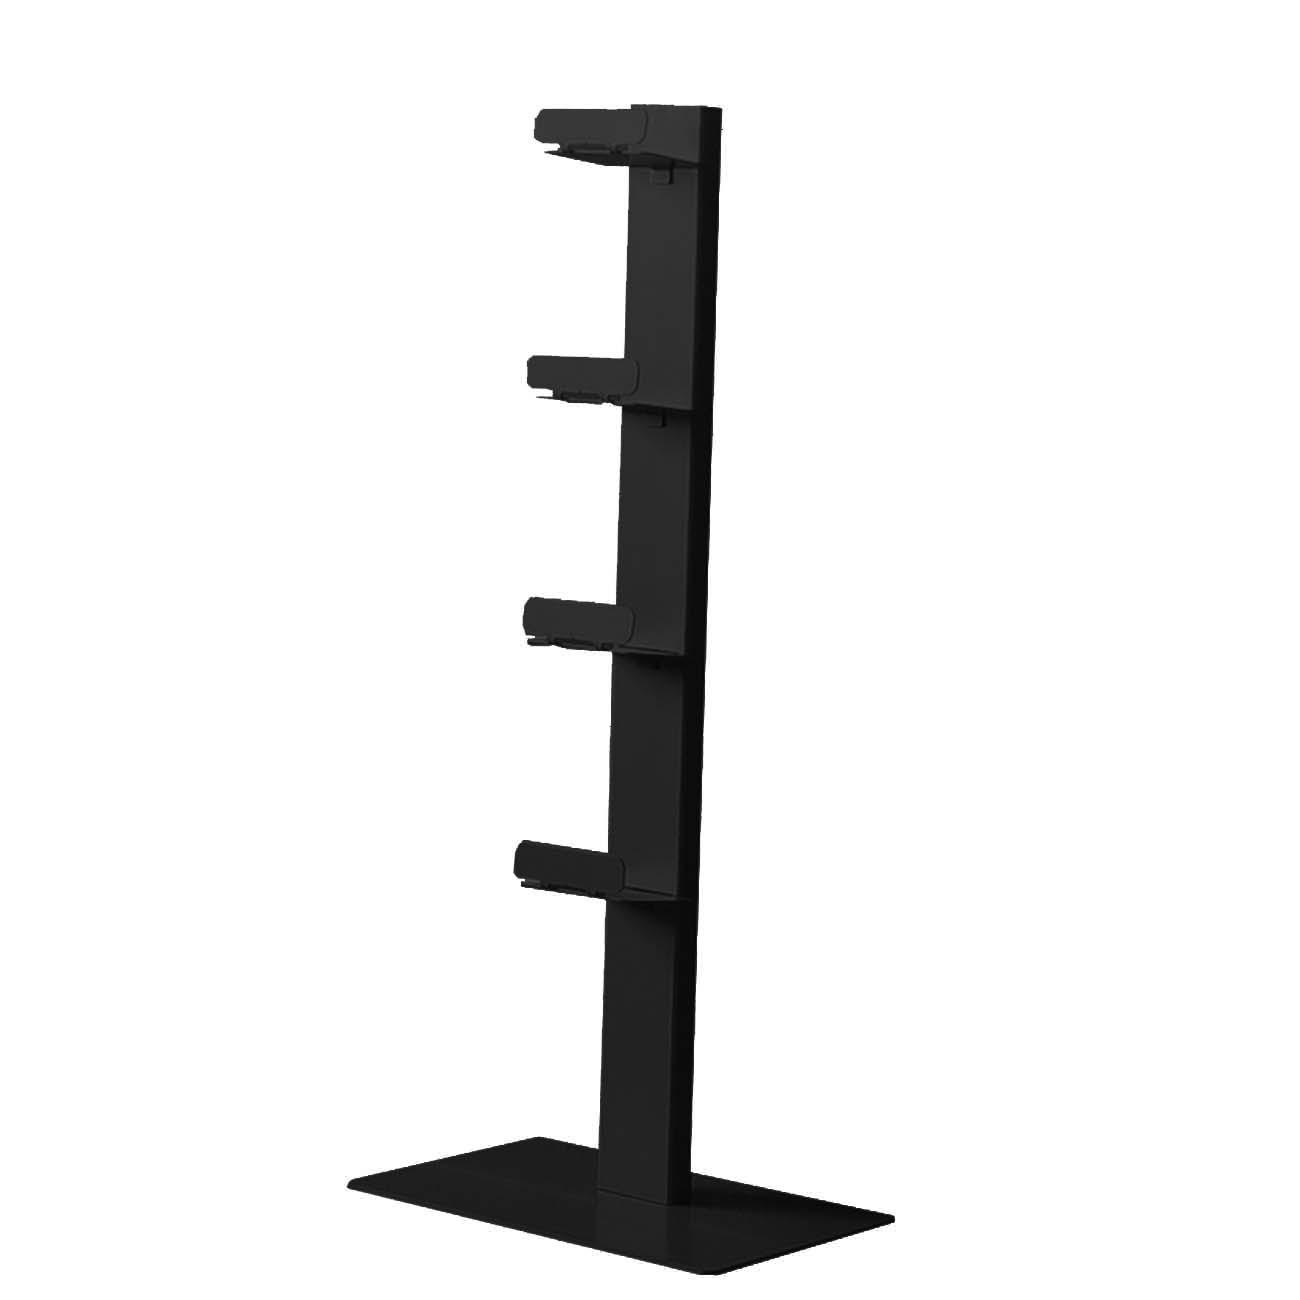 radius cd baum regal schwarz stand 2 klein 737 a m bel regale standregale. Black Bedroom Furniture Sets. Home Design Ideas